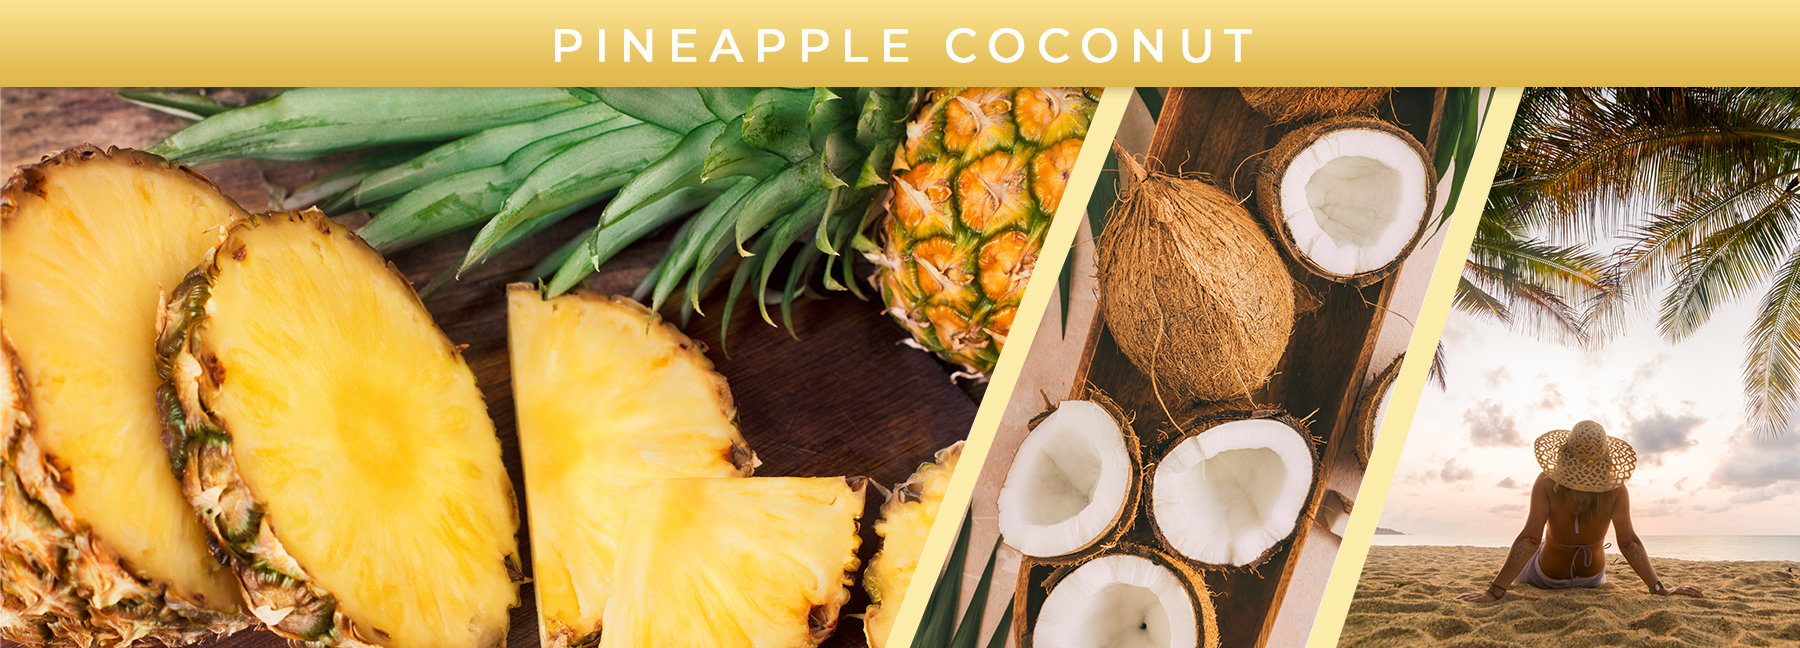 Pineapple Coconut fragrance elements